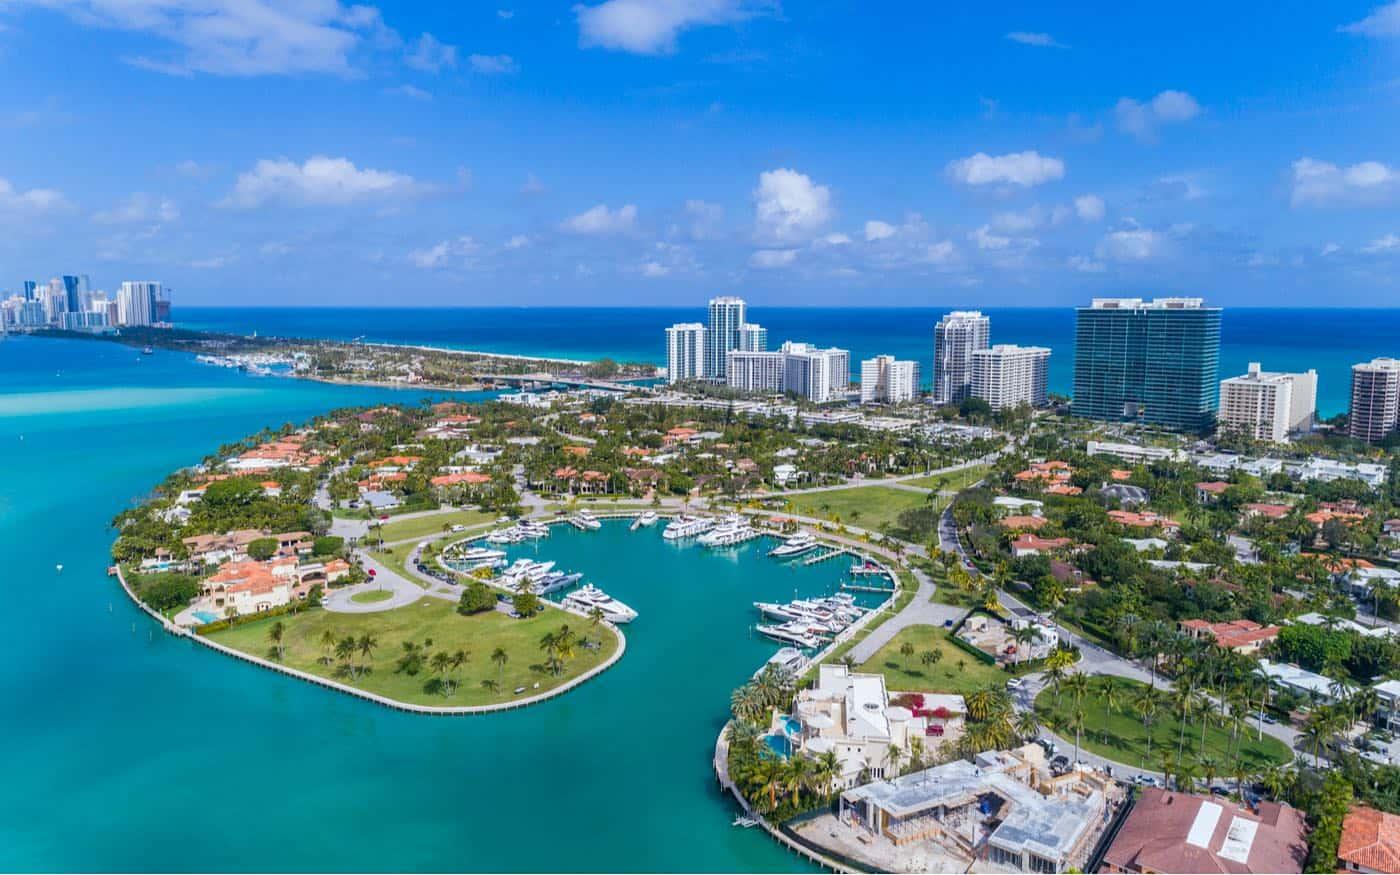 Bal Harbor, Florida